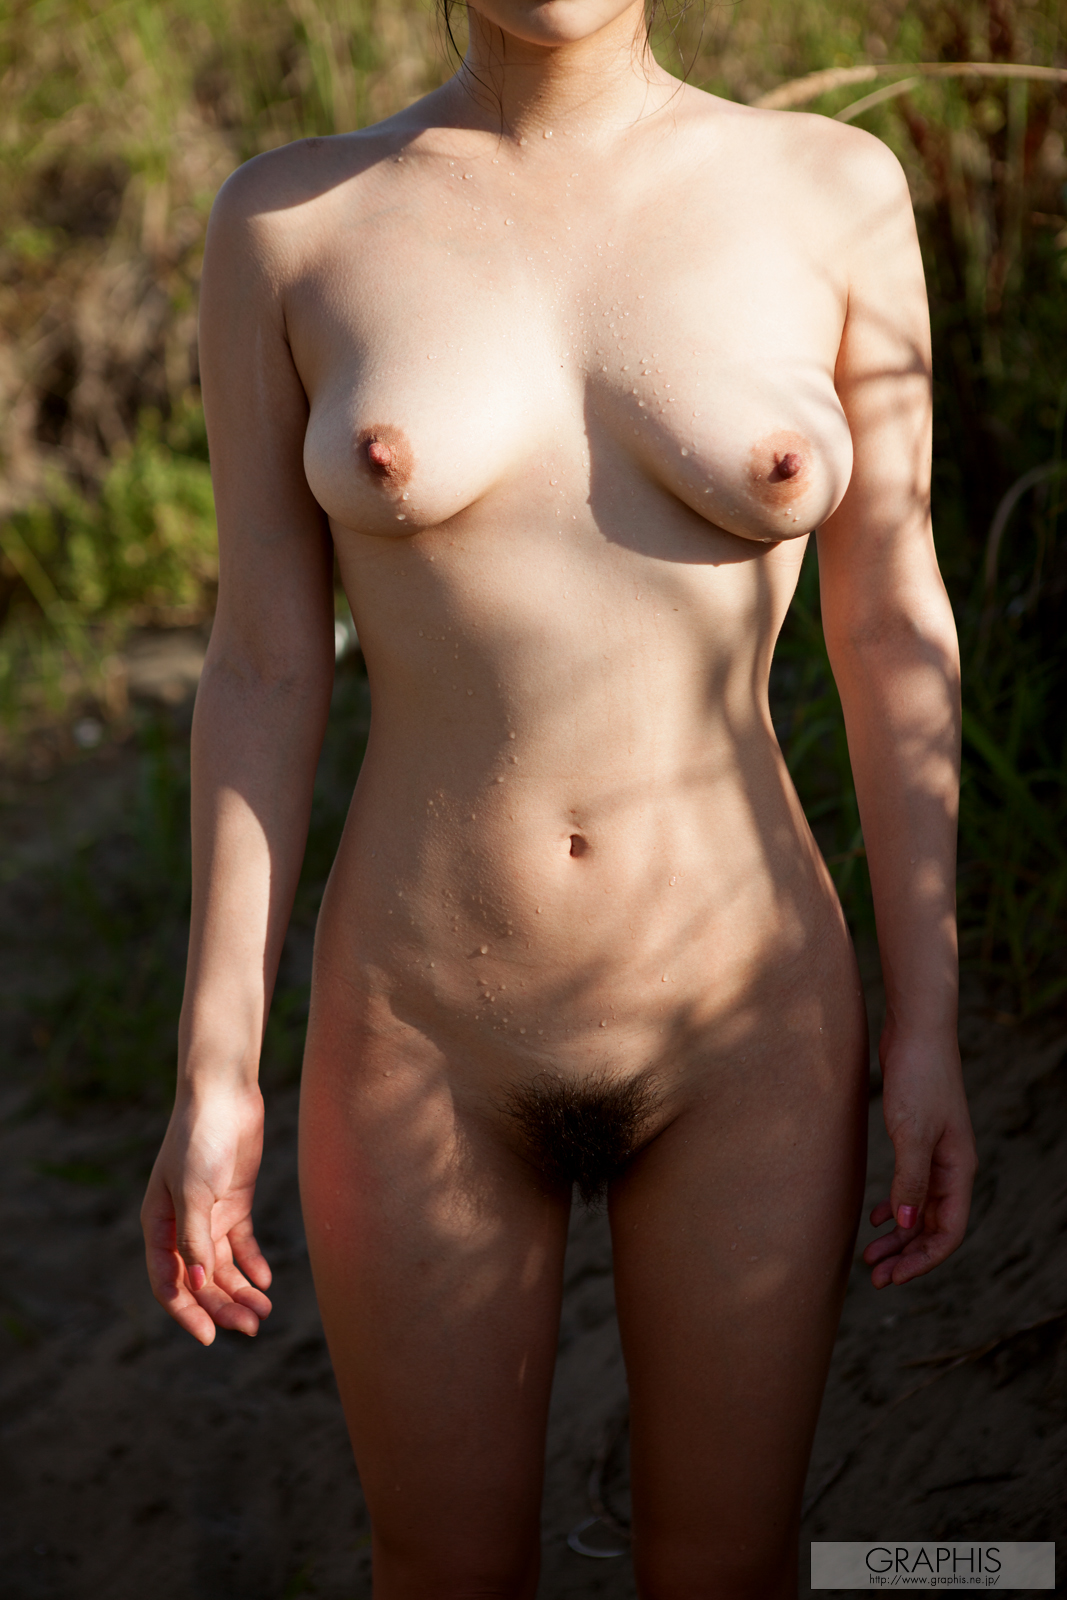 kana-tsuruta-nude-asian-graphis-15